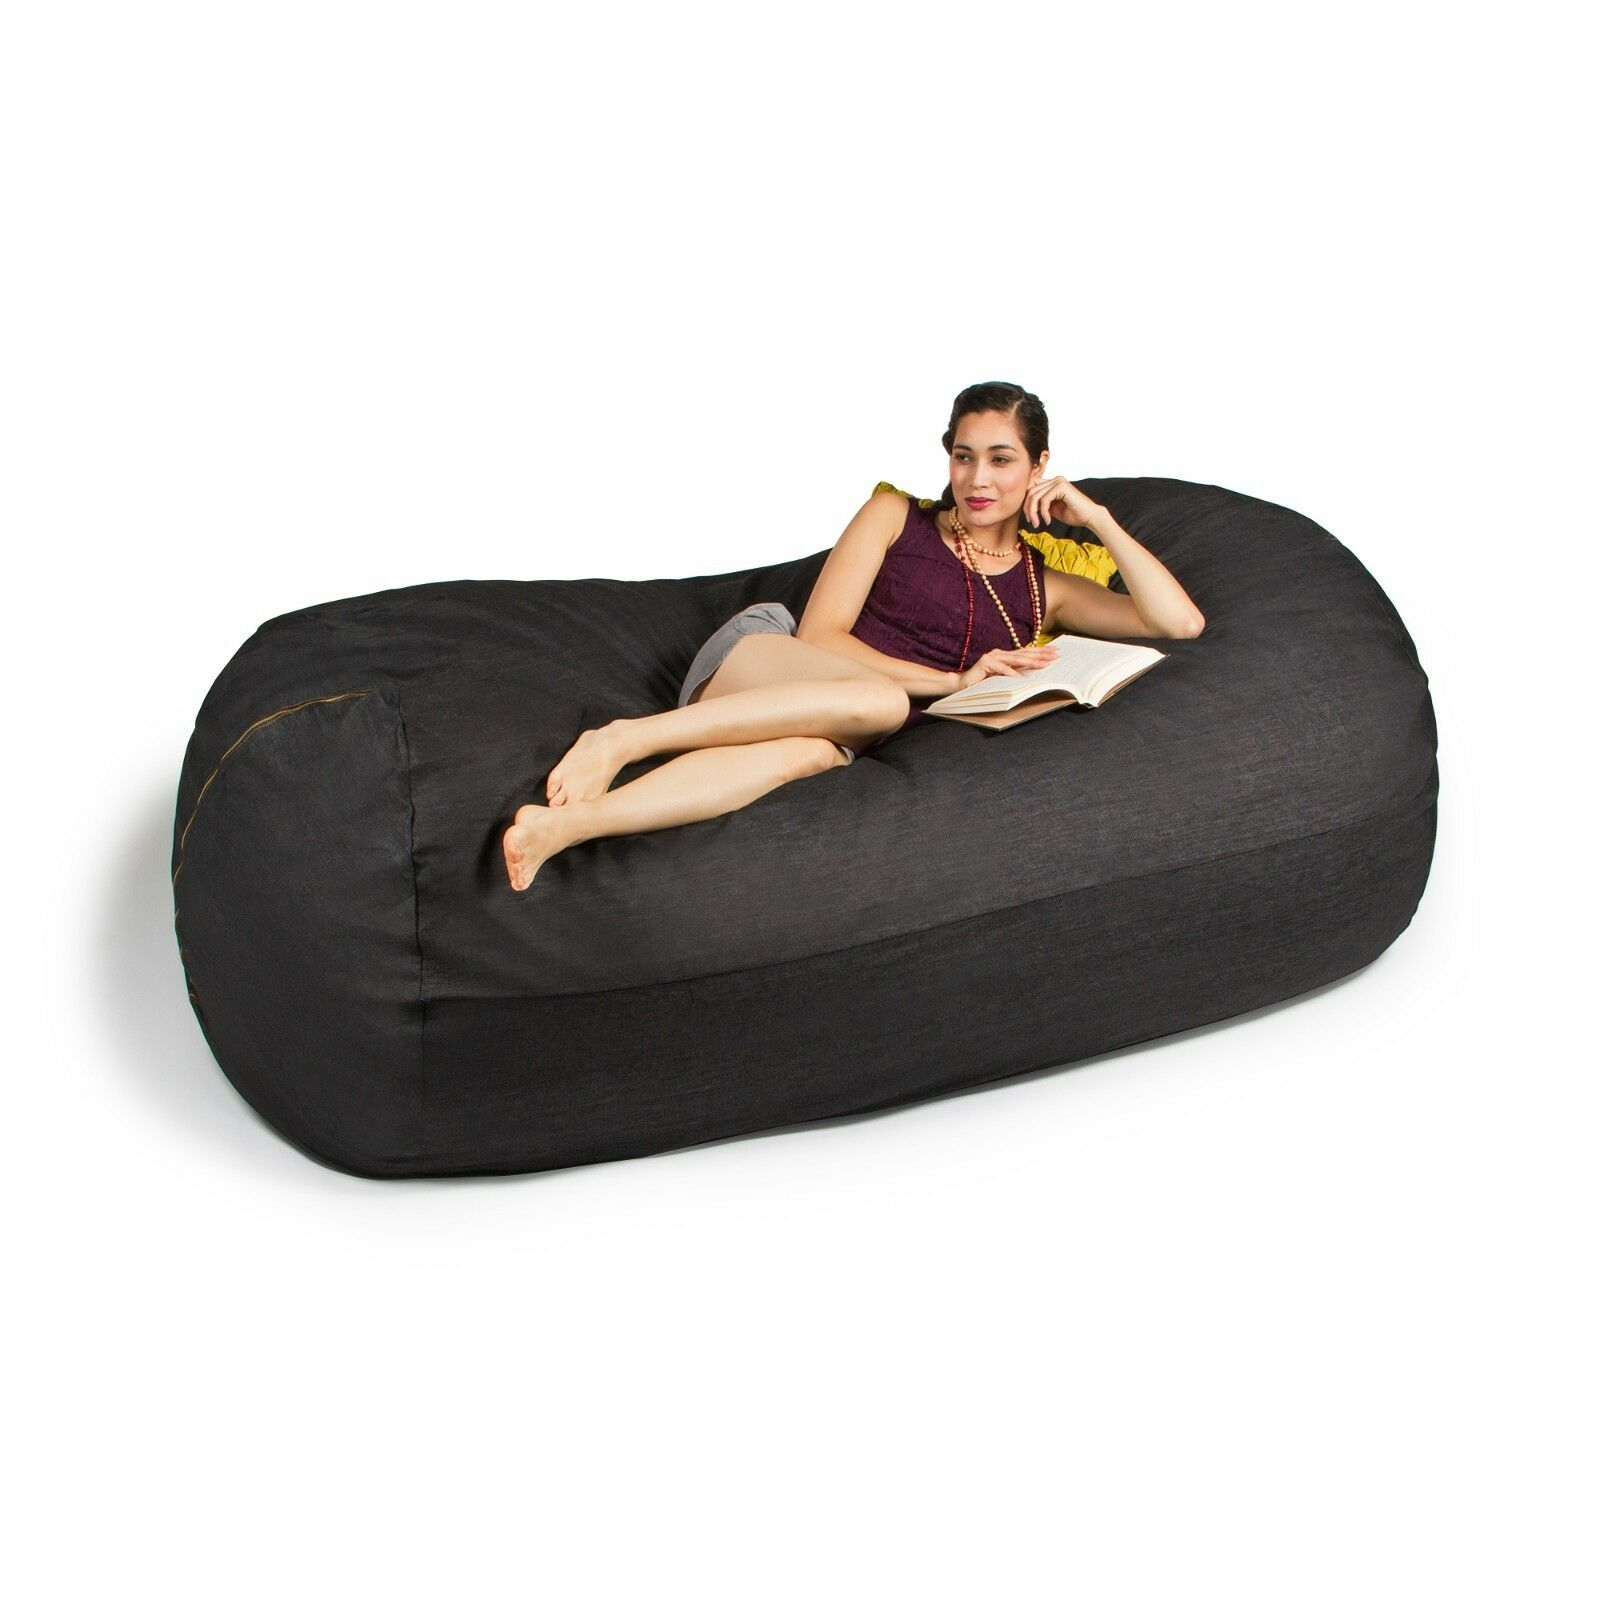 Jaxx 7 FT Giant Bean Bag Sofa Black Denim